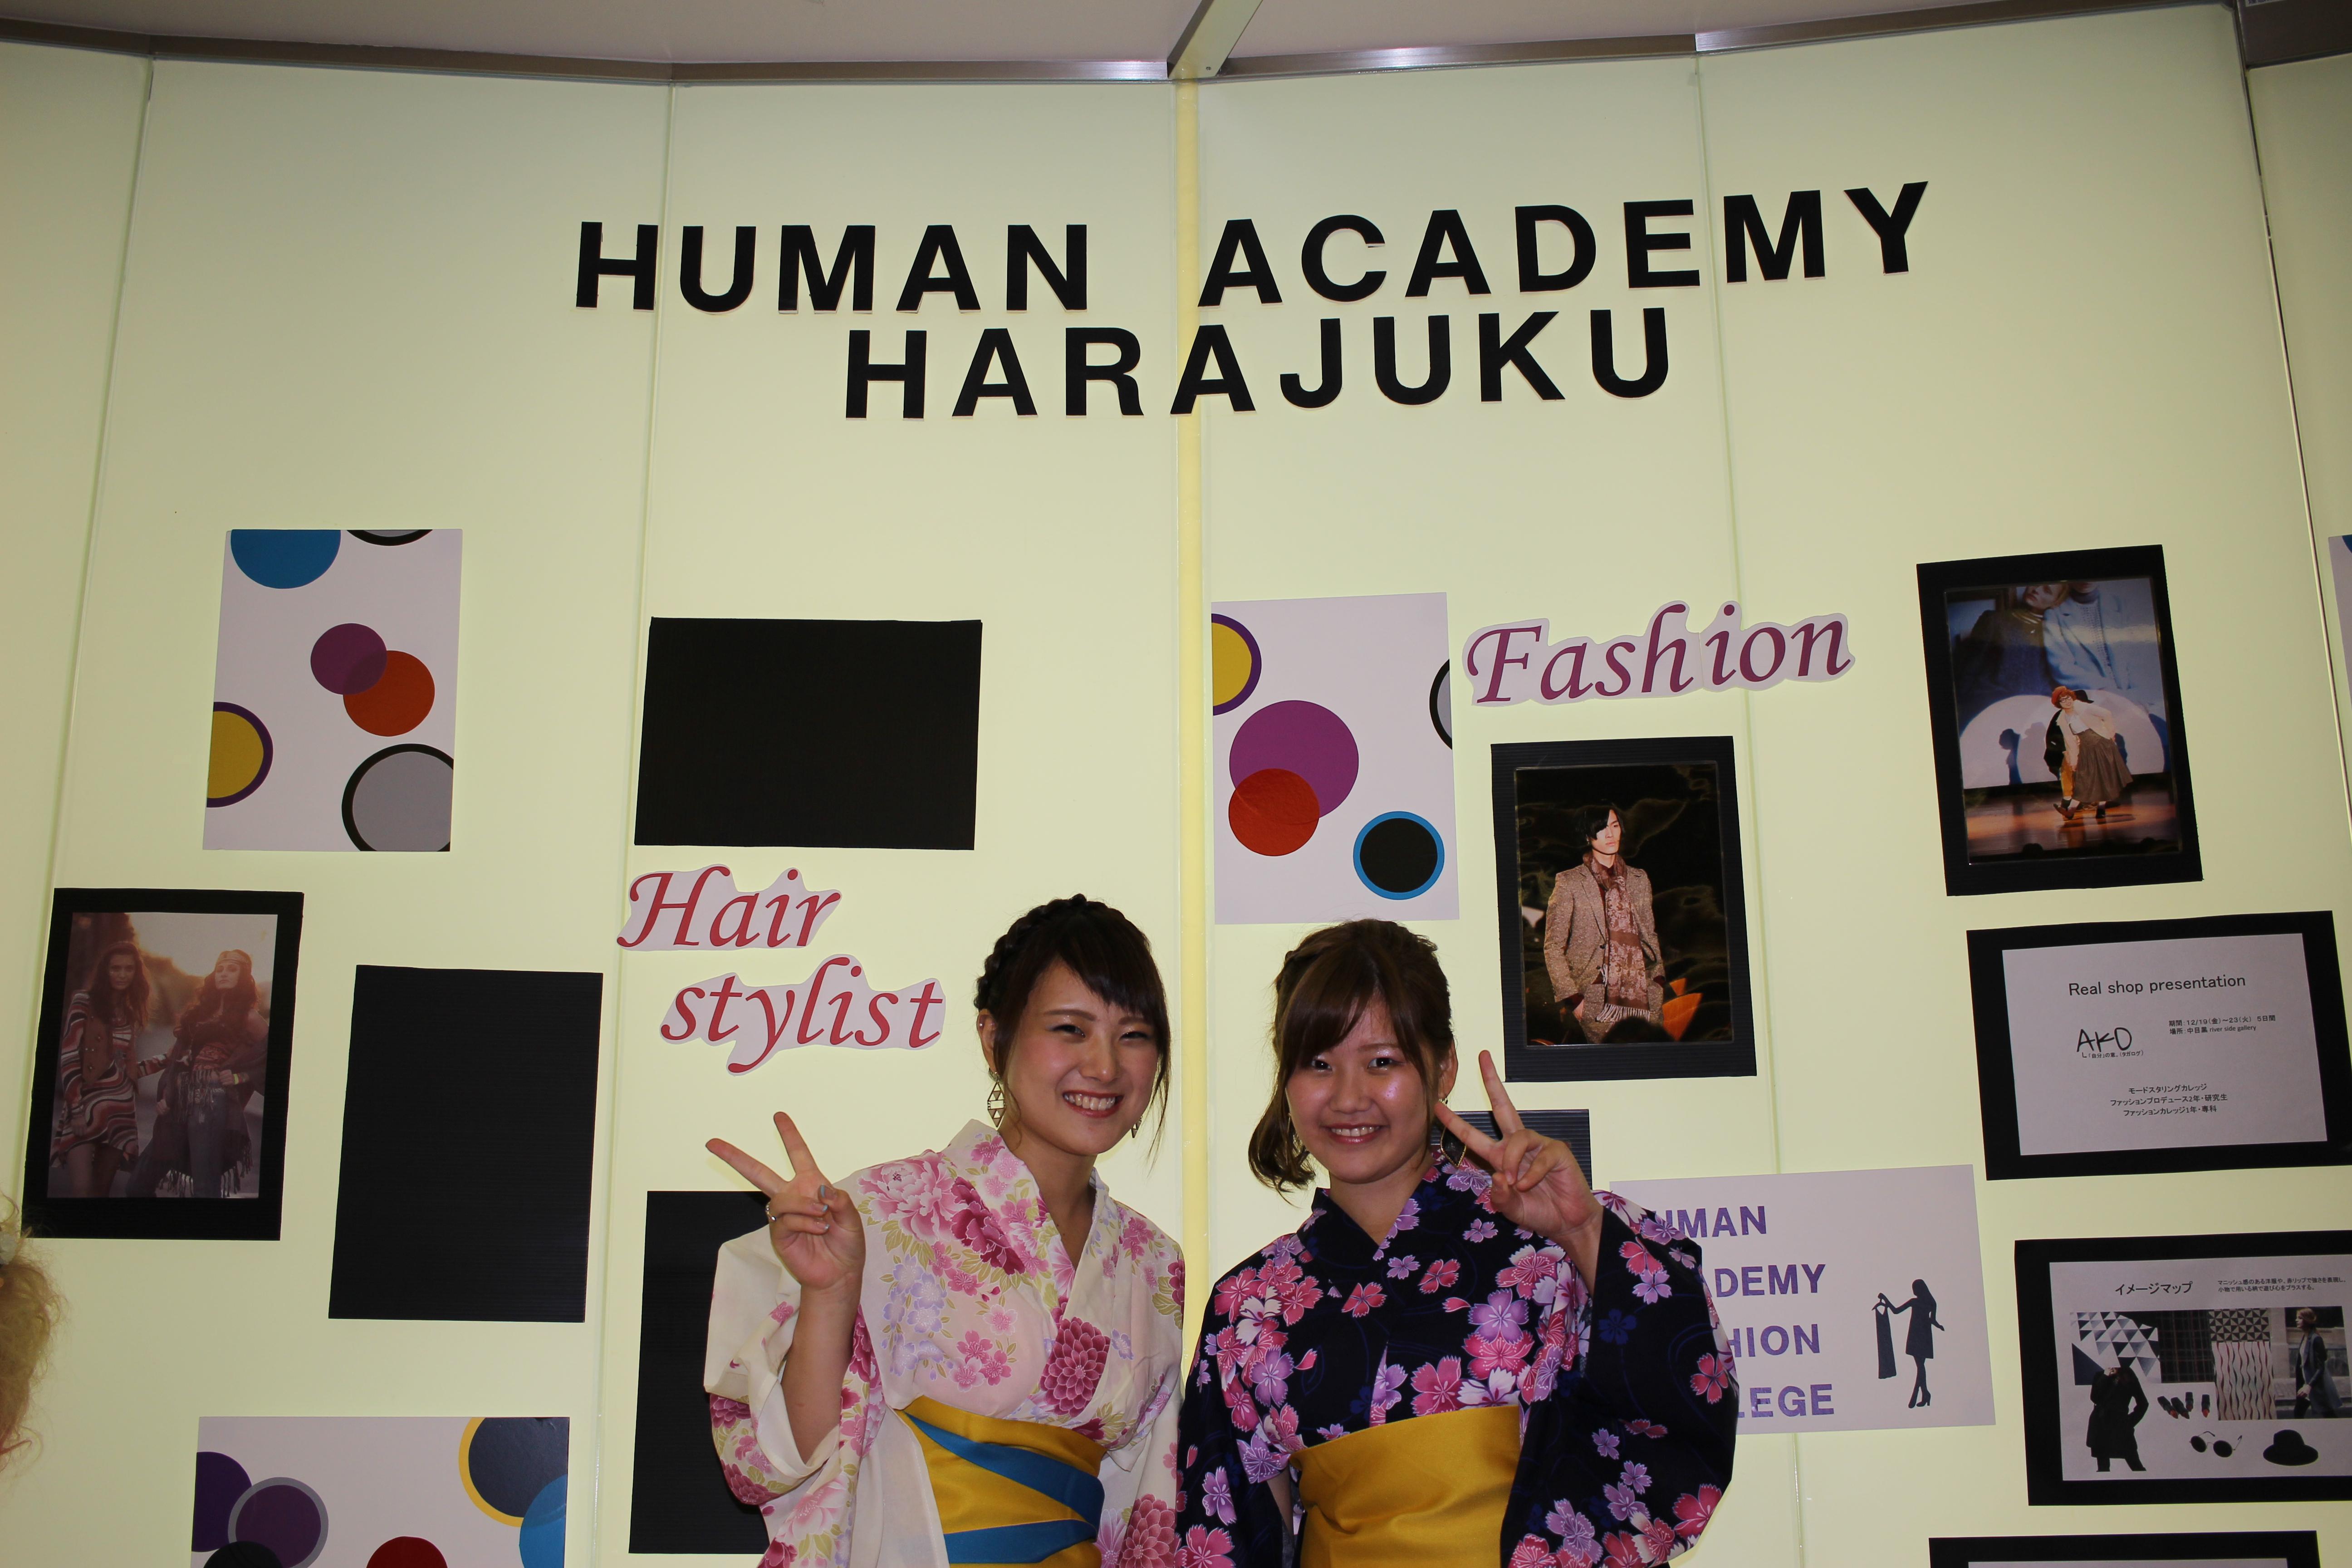 http://ha.athuman.com/beauty/fashion/images/IMG_2274.JPG